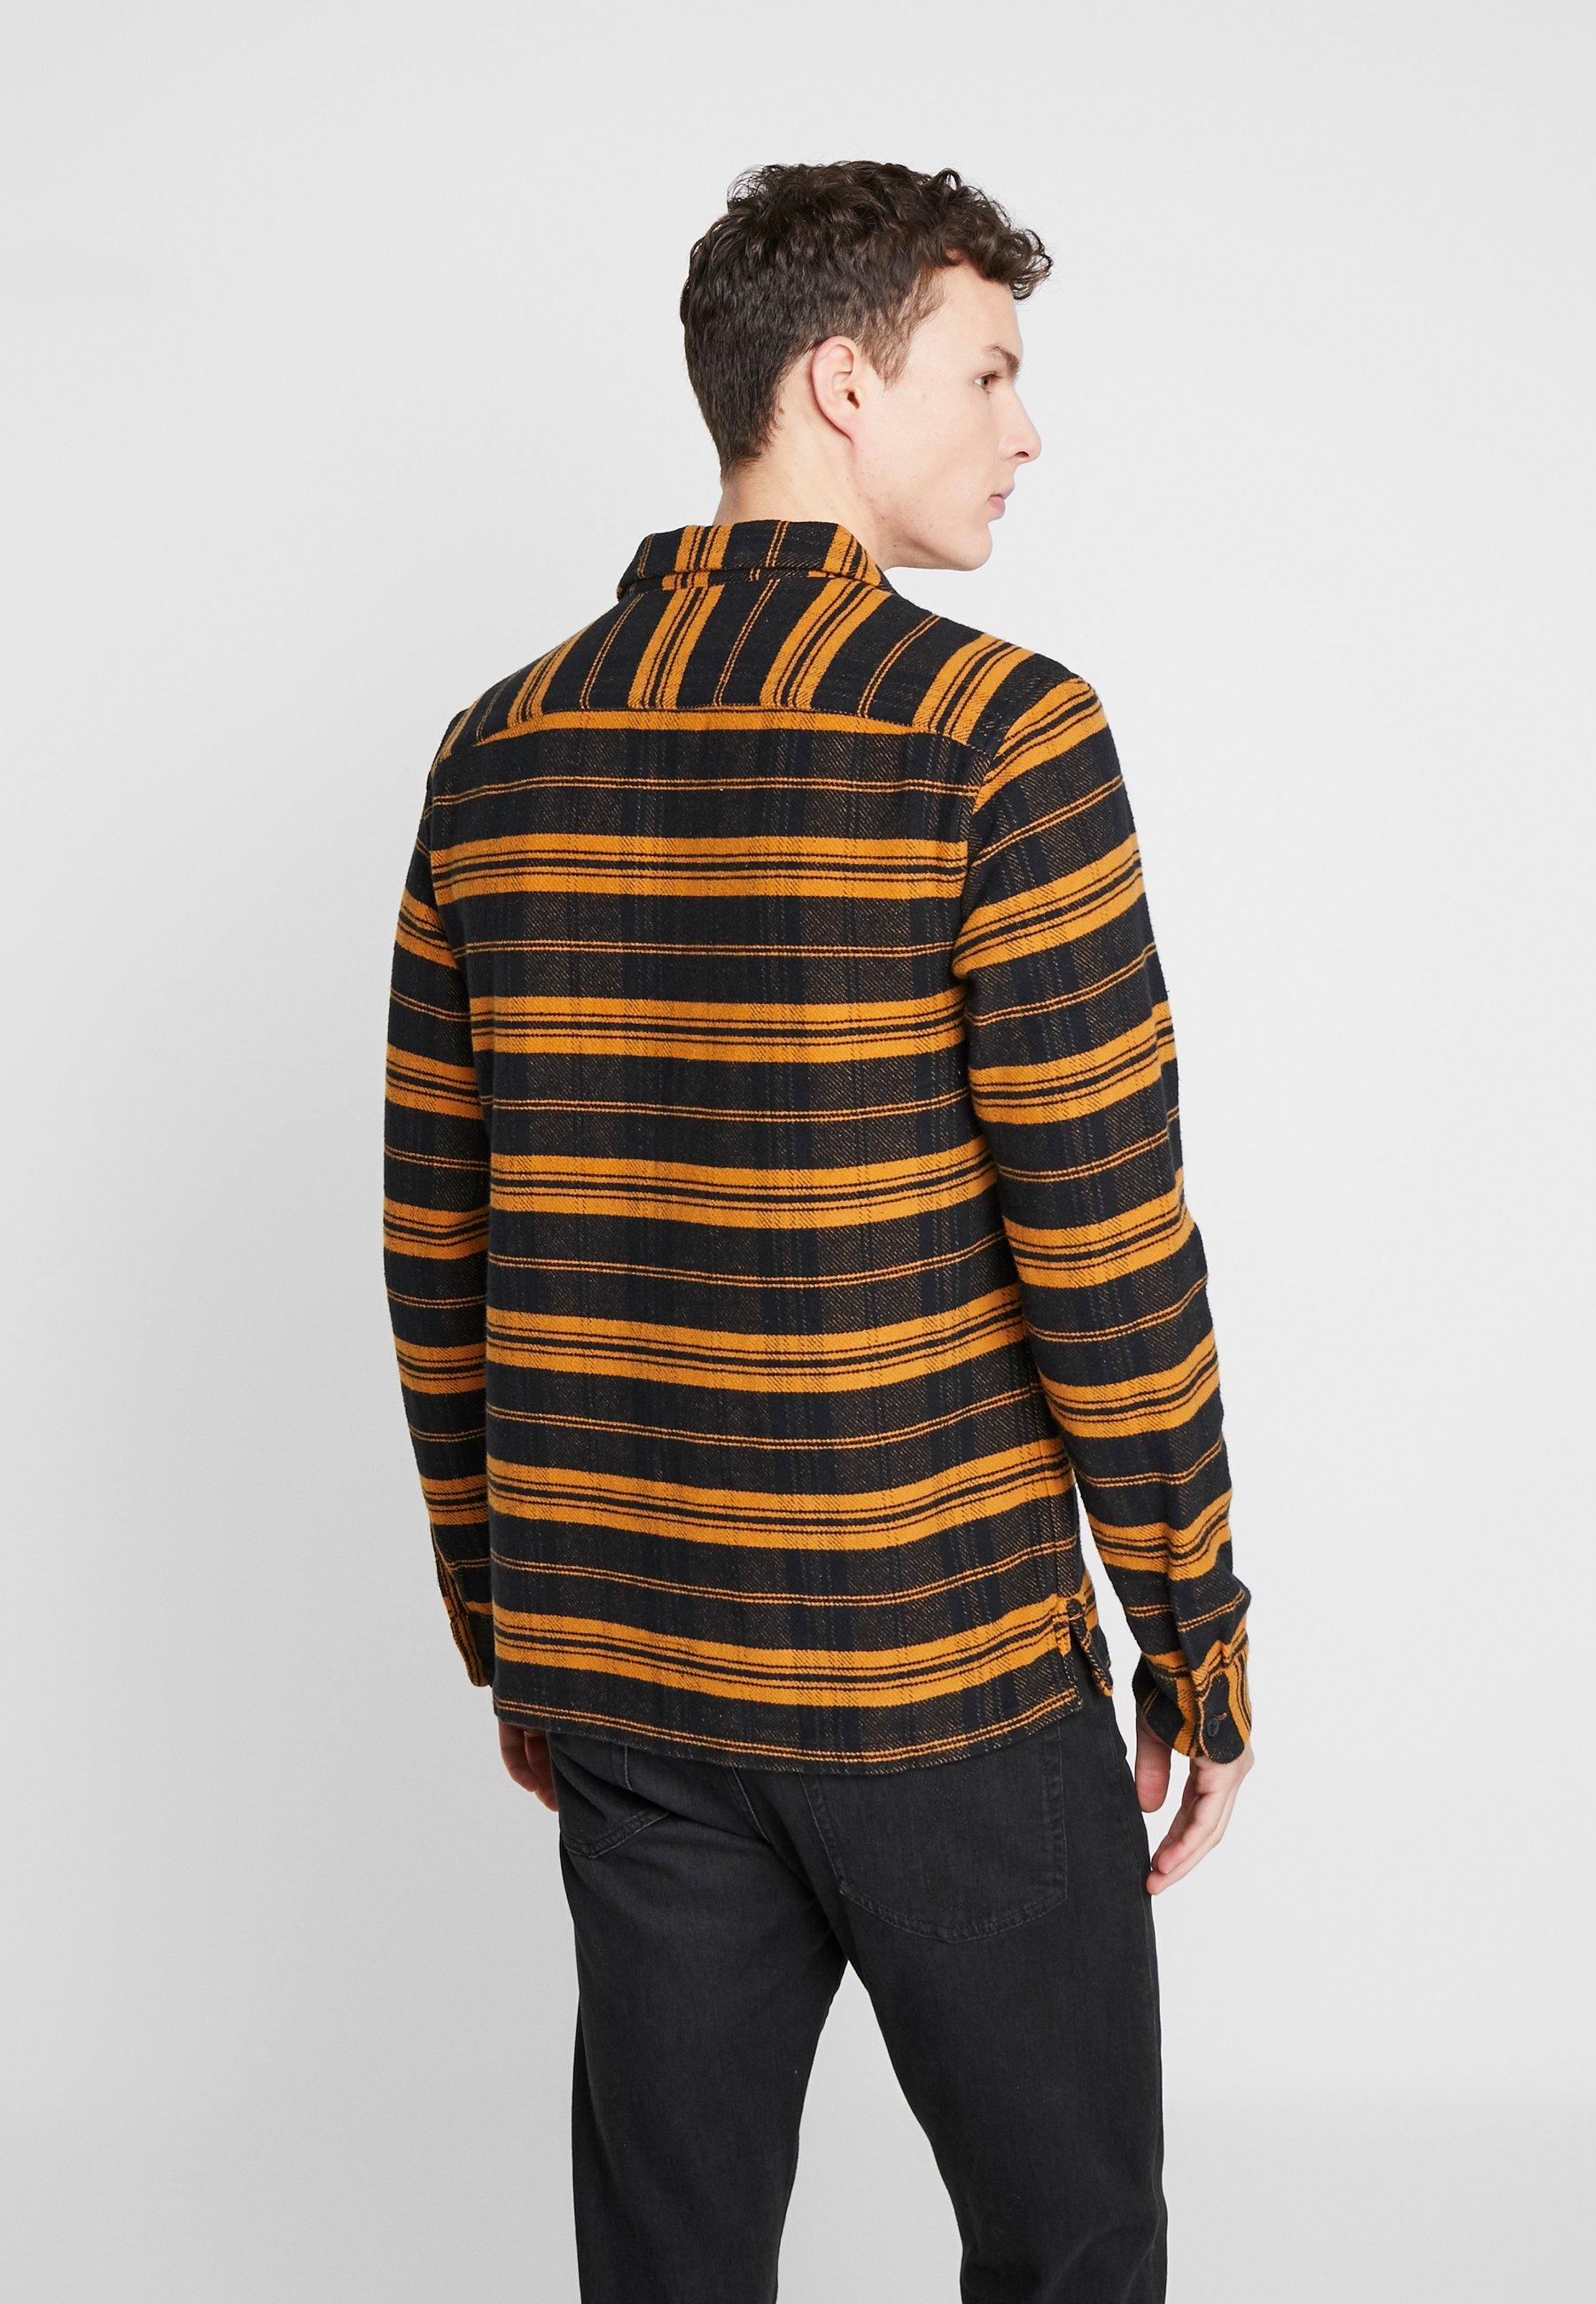 AllSaints OXBOW SHIRT - Koszula - yellow/black